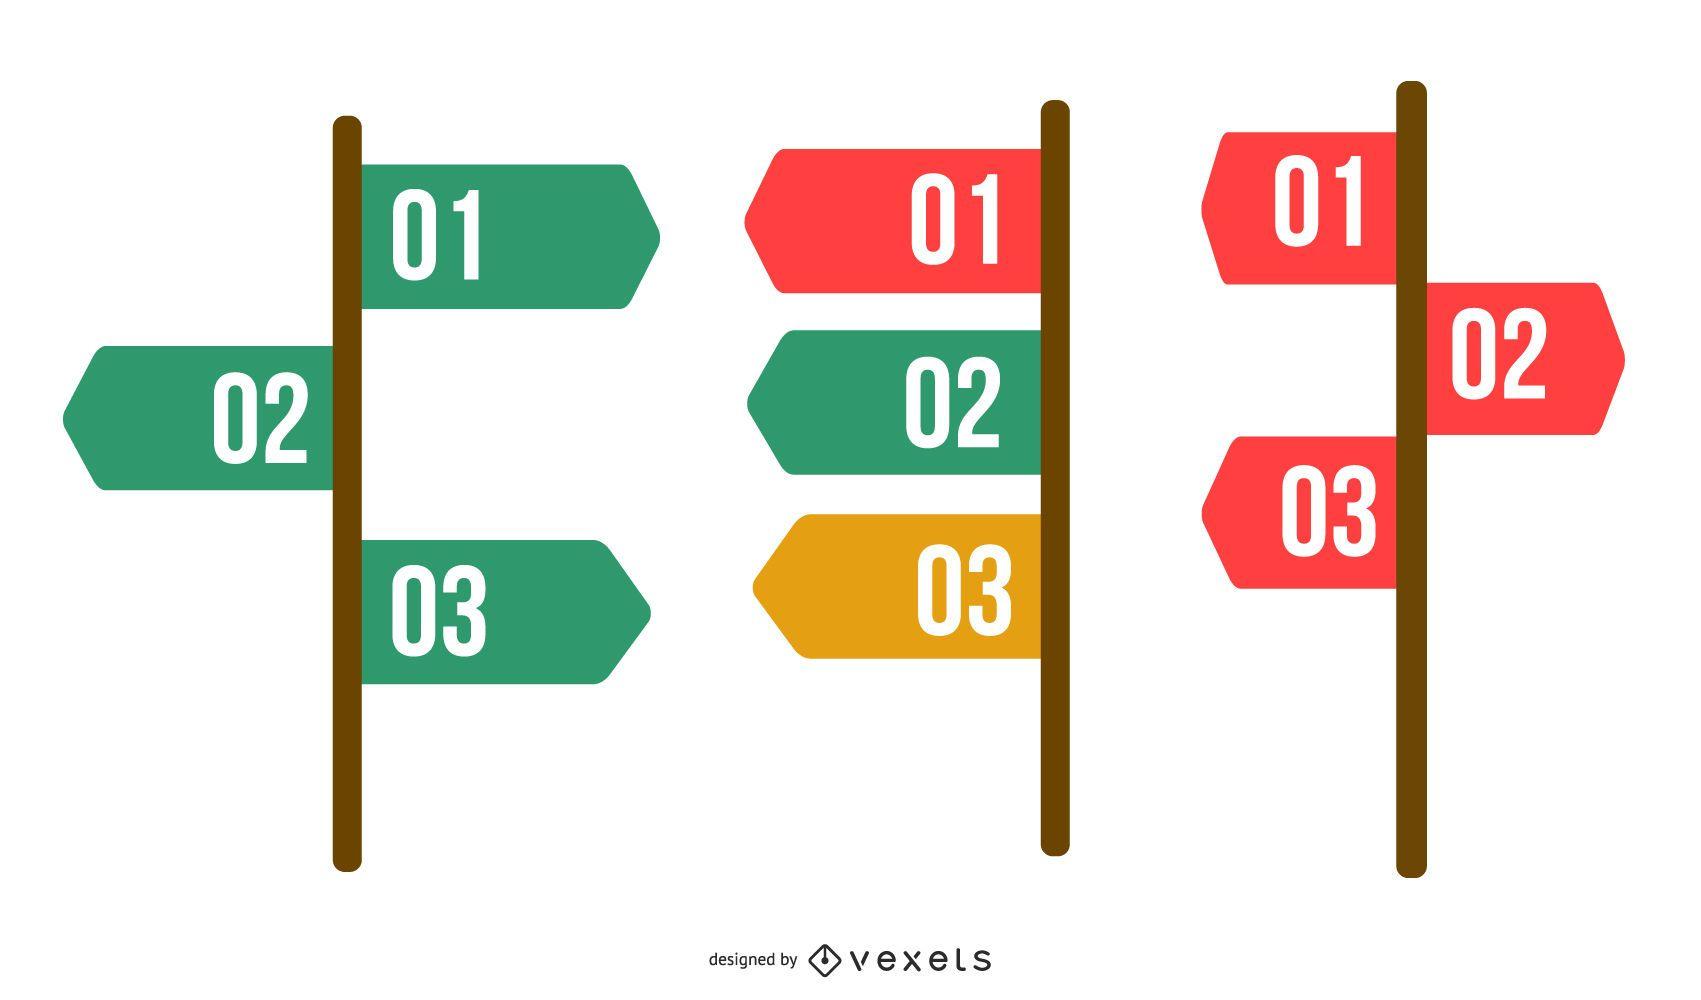 Classy 3 Steps Navigation Infographic